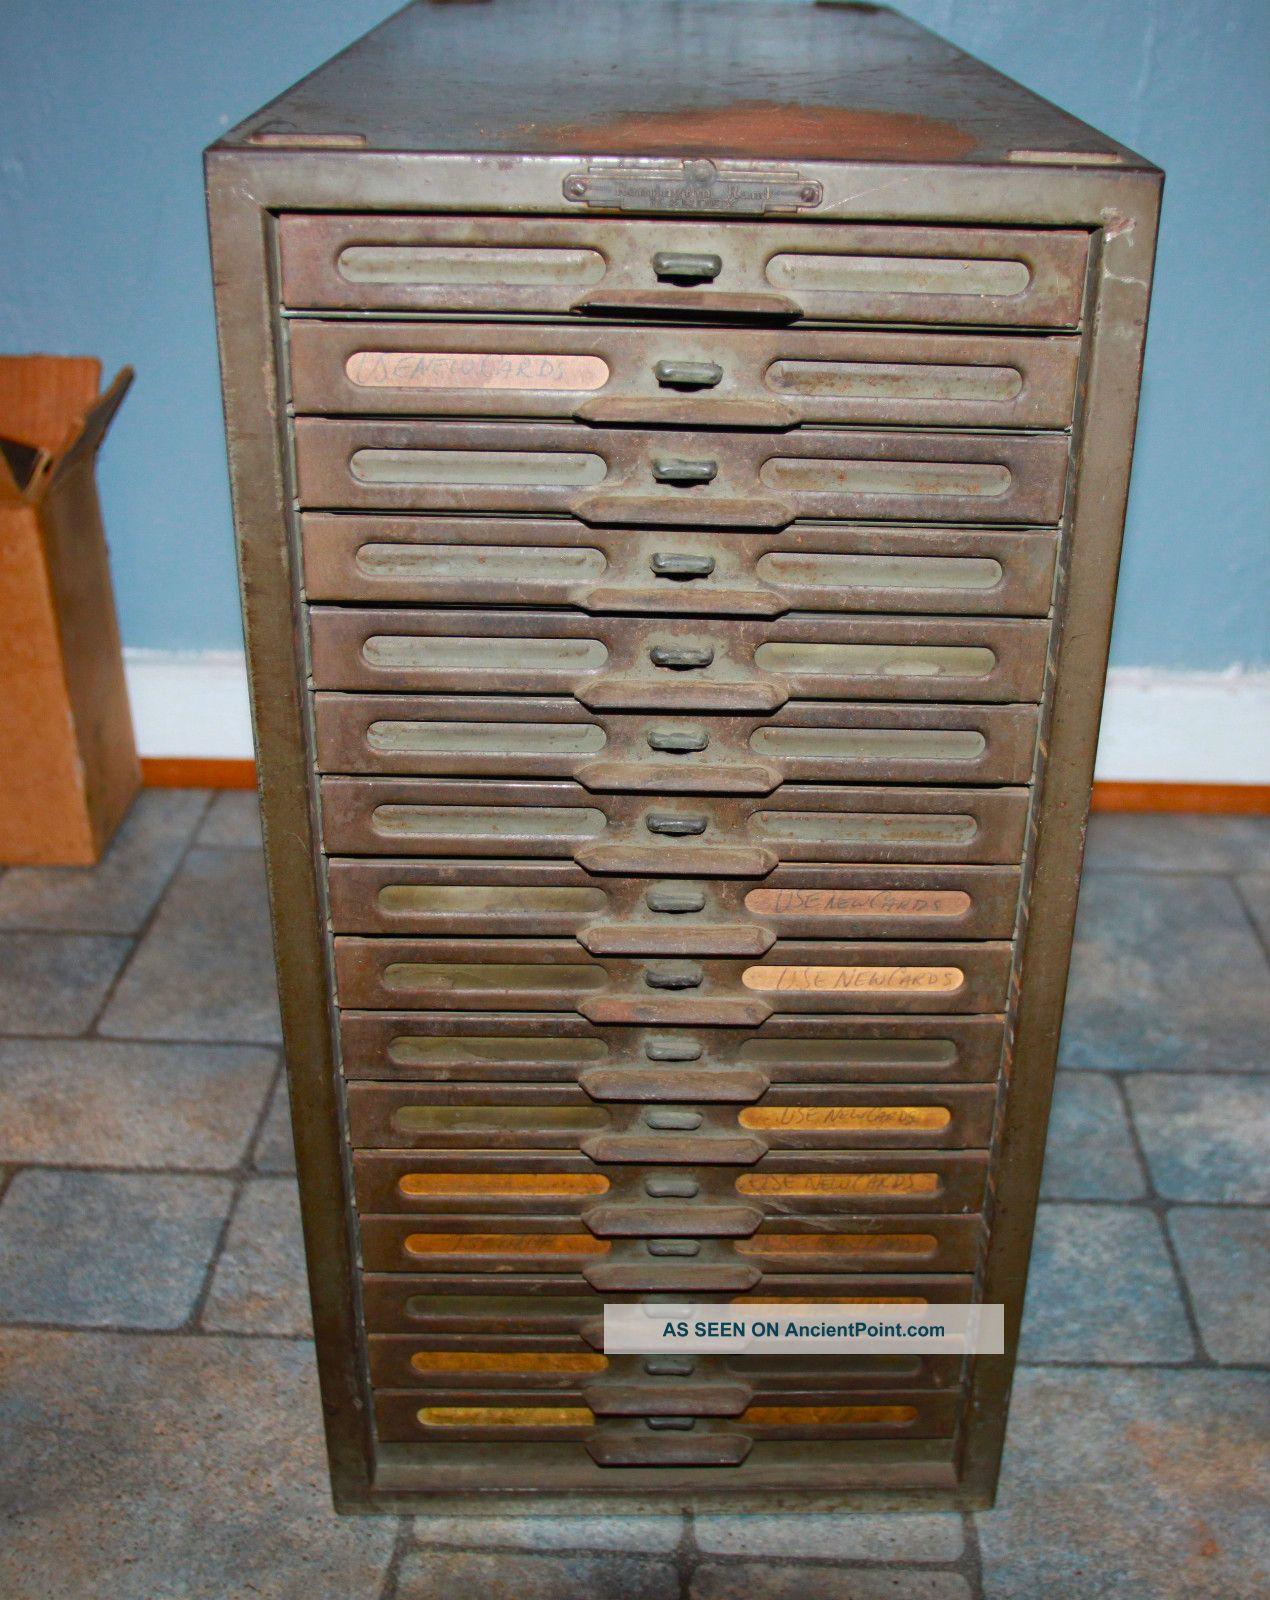 Vintage Industrial Remington Rand Kardex Metal File Cabinet 16 Drawers  Factory - Vintage Industrial Remington Rand Kardex Metal File Cabinet 16